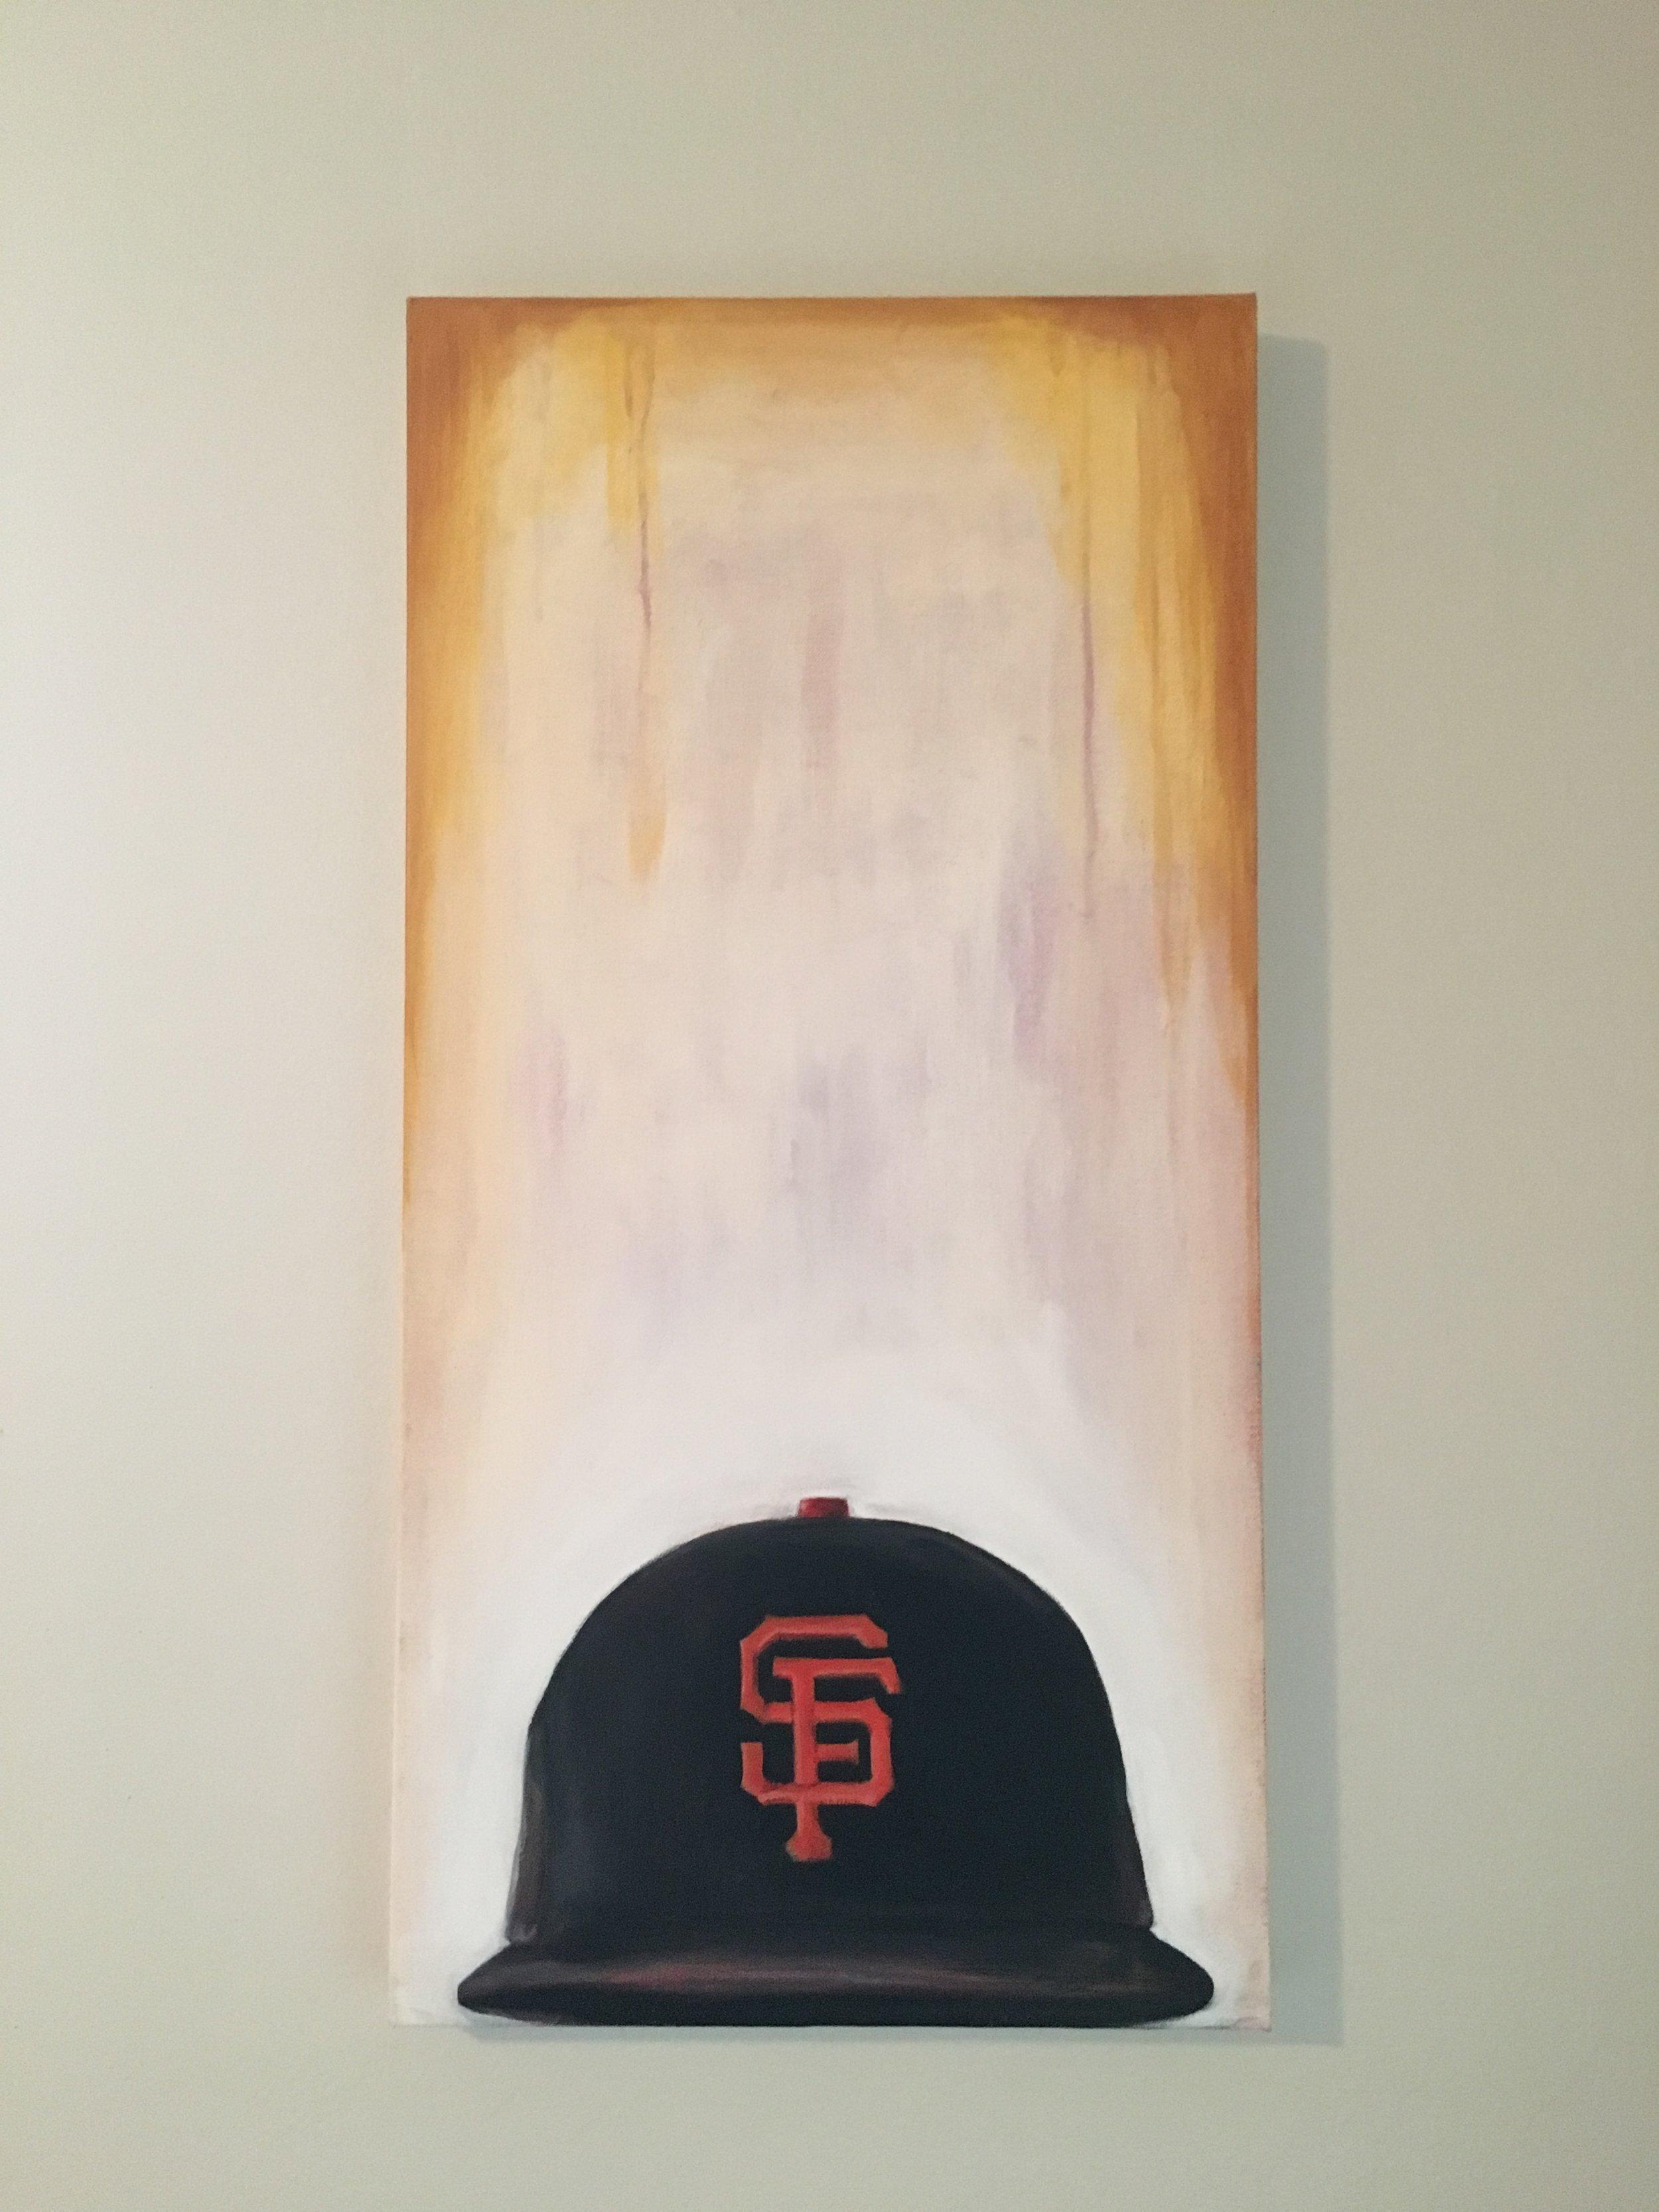 Giants - Spray paint and acrylic on wood